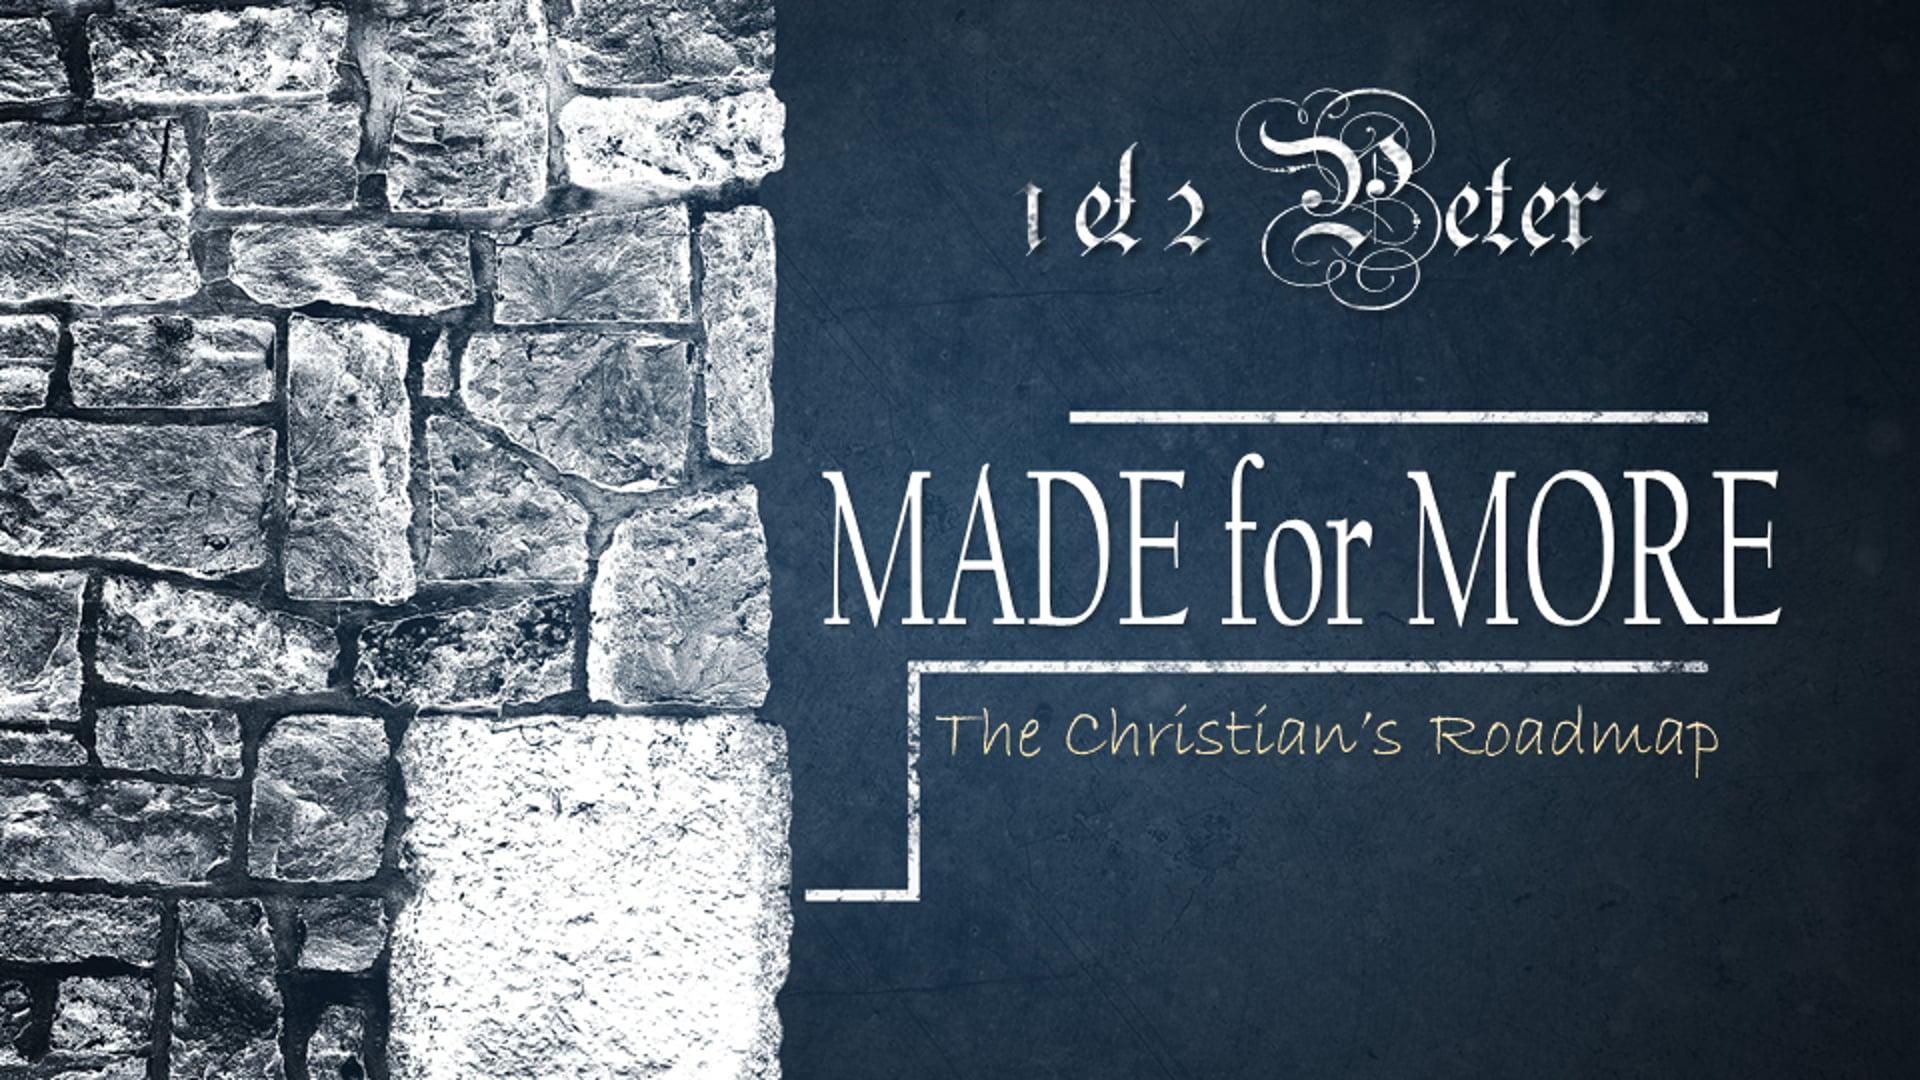 CCC Online Worship - August 23, 2020